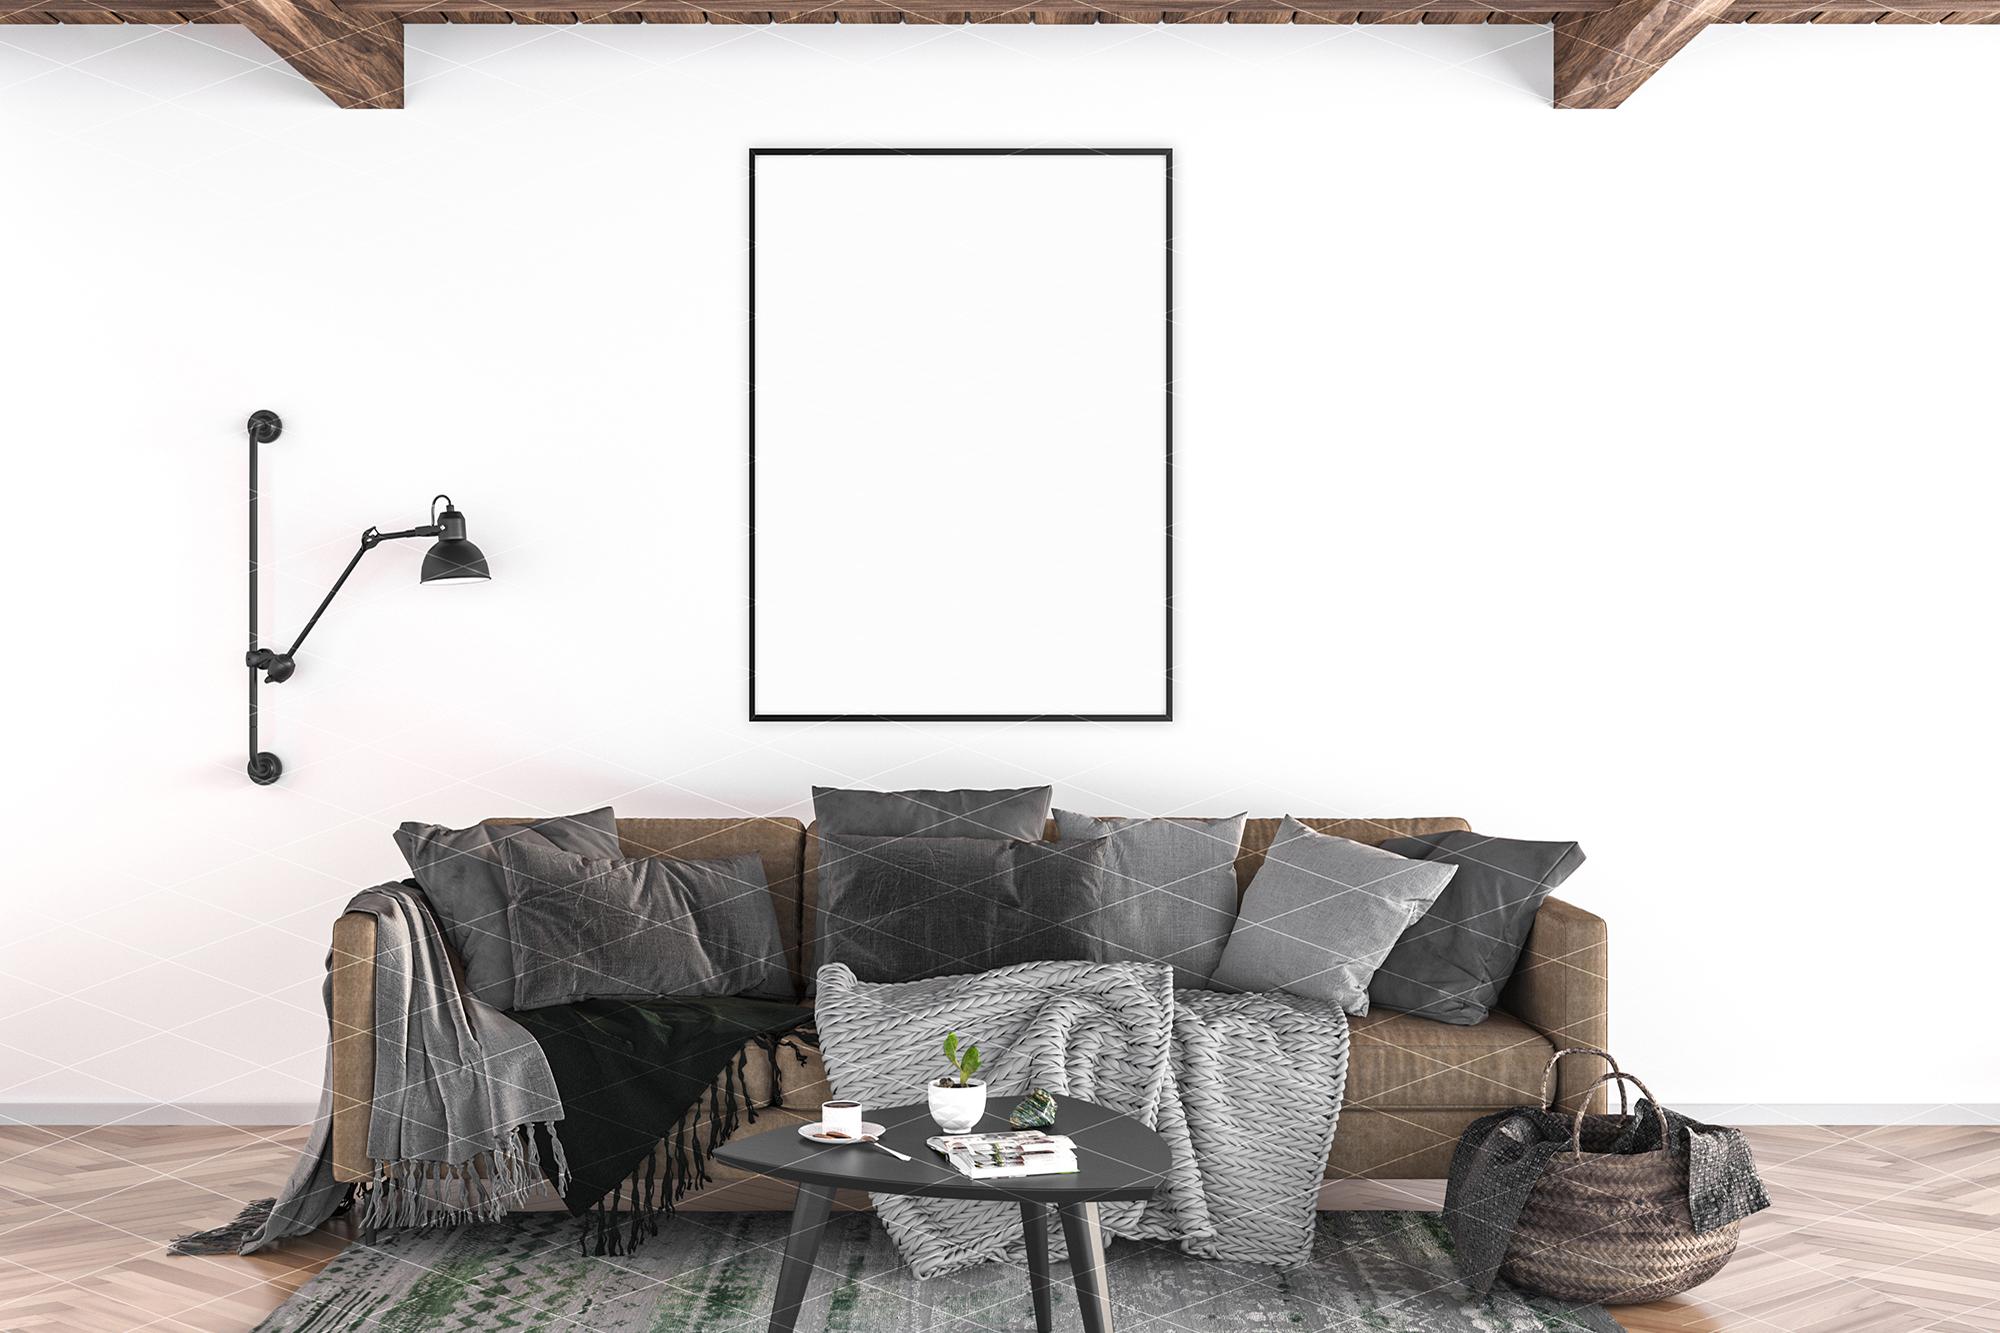 Interior mockup - artwork background example image 4